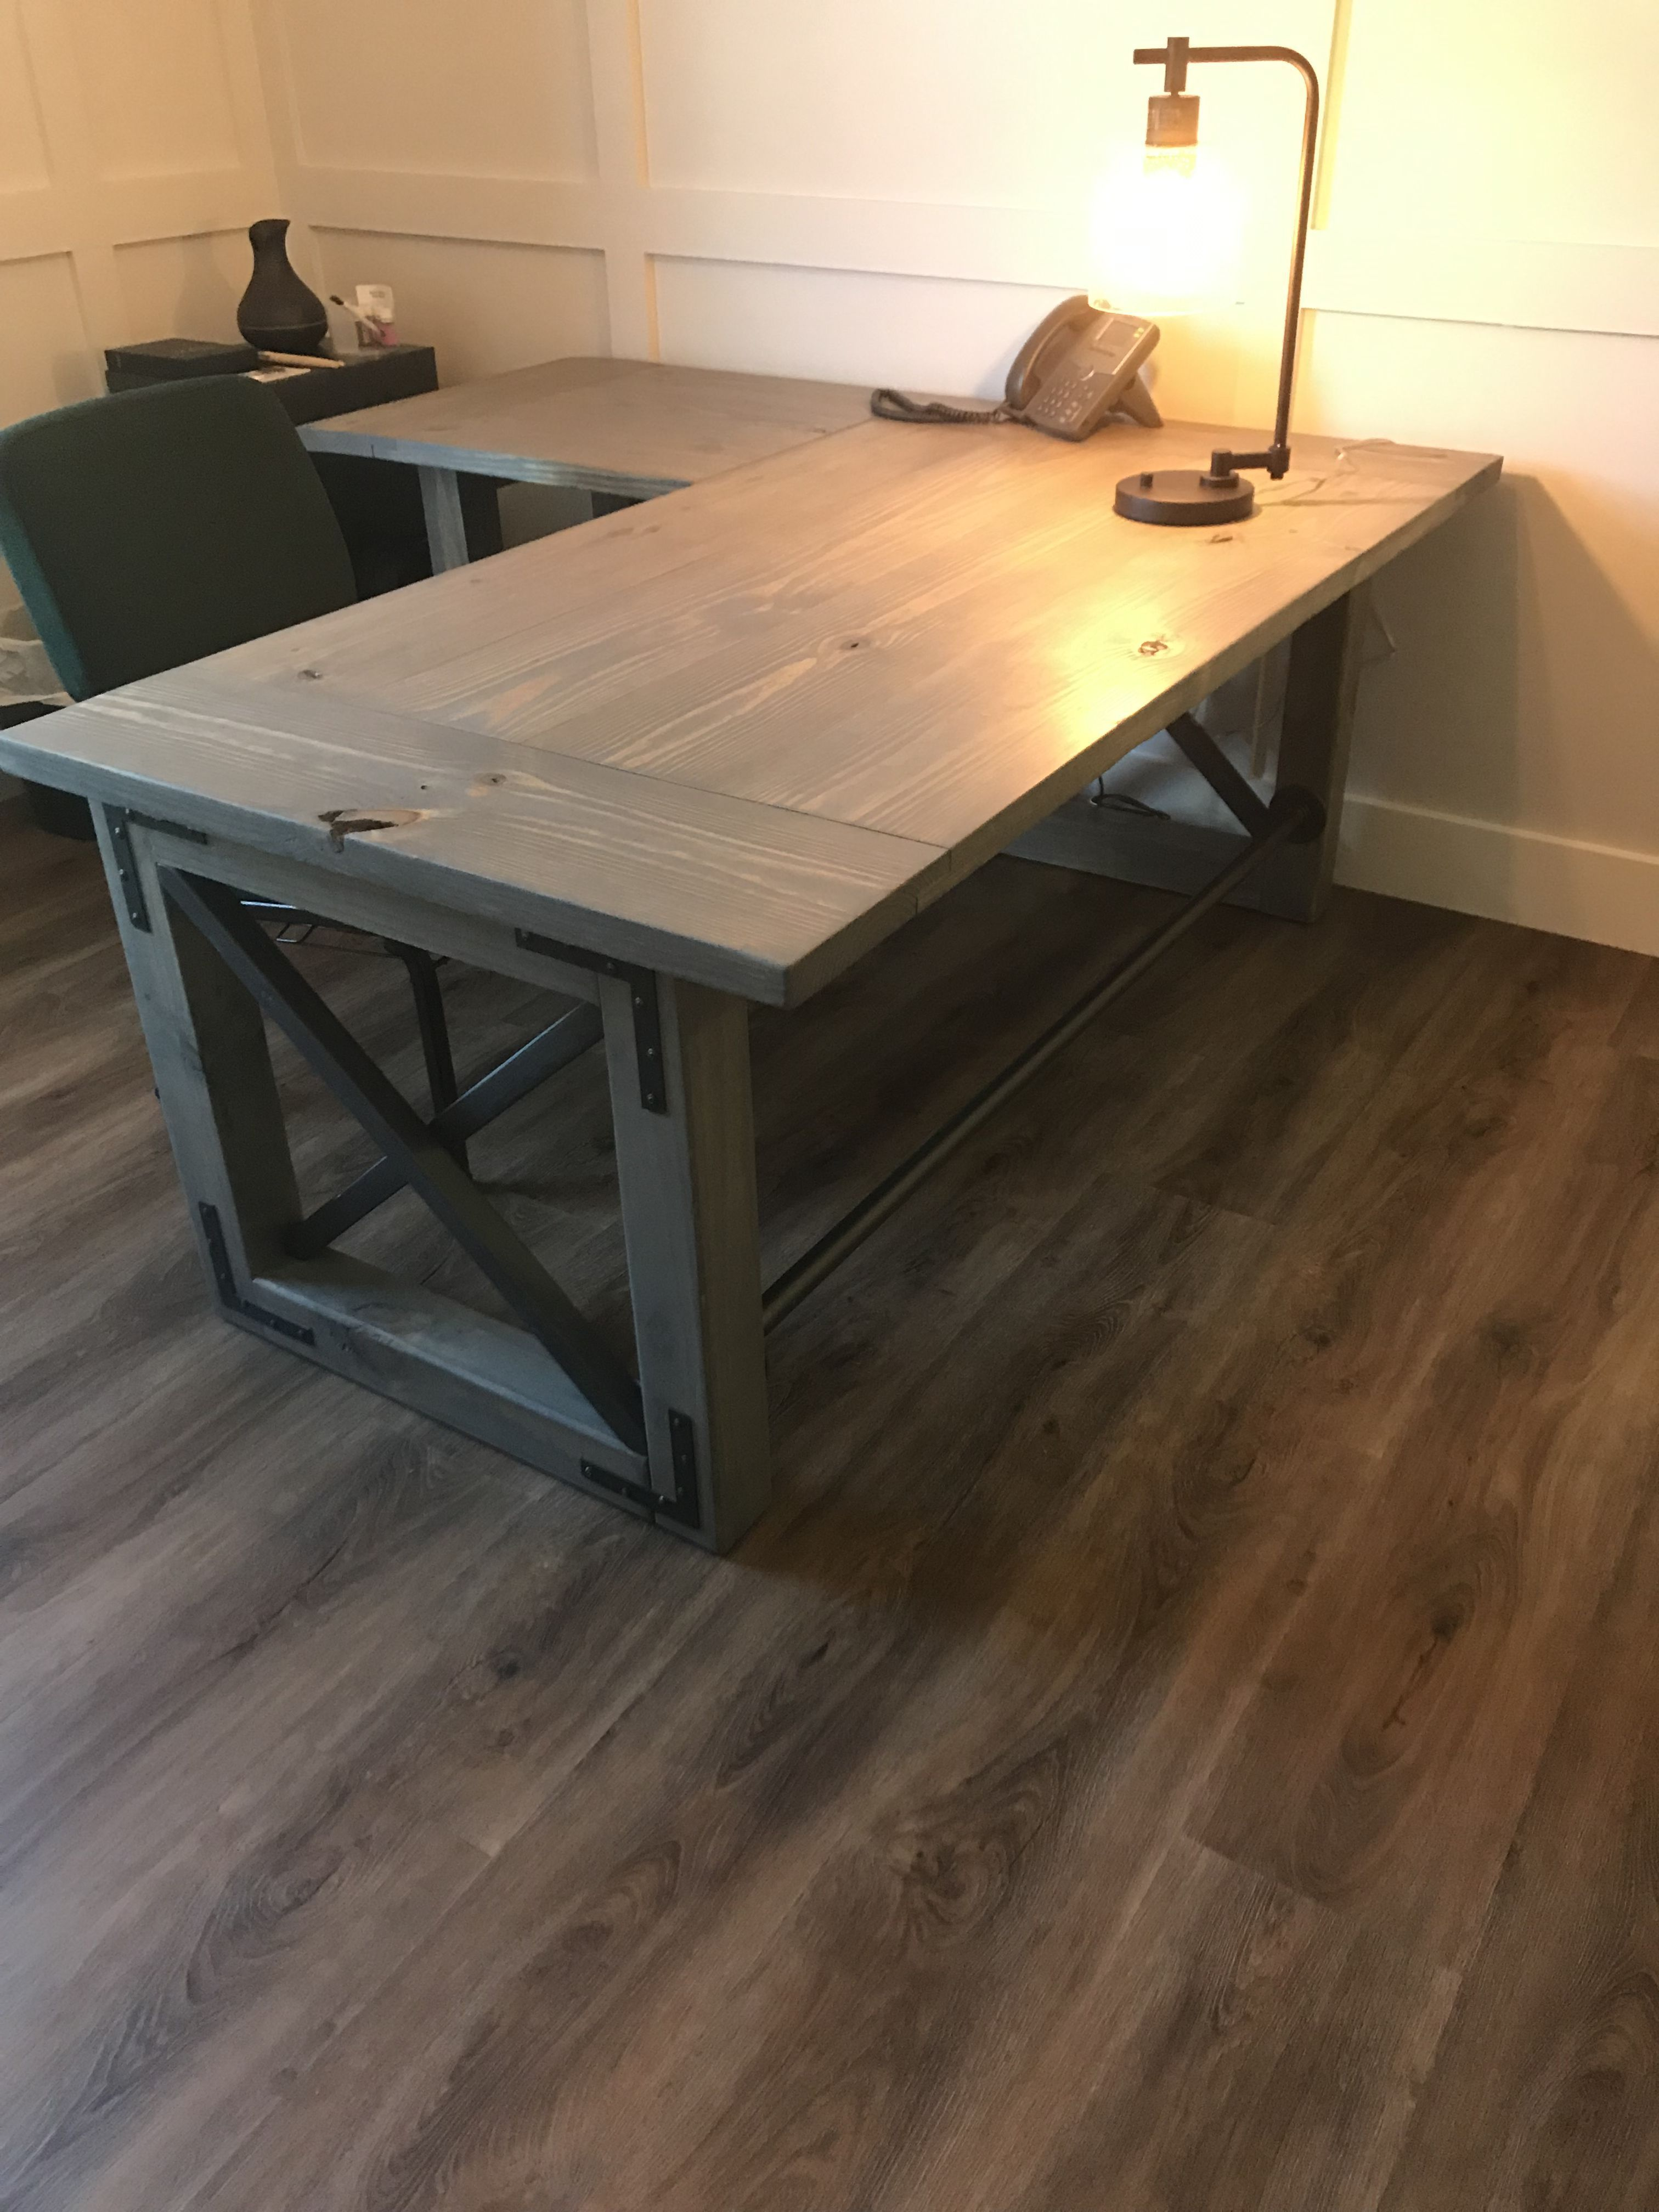 7 Beautiful Home Desk Ideas Make Comfortable (for Cozy